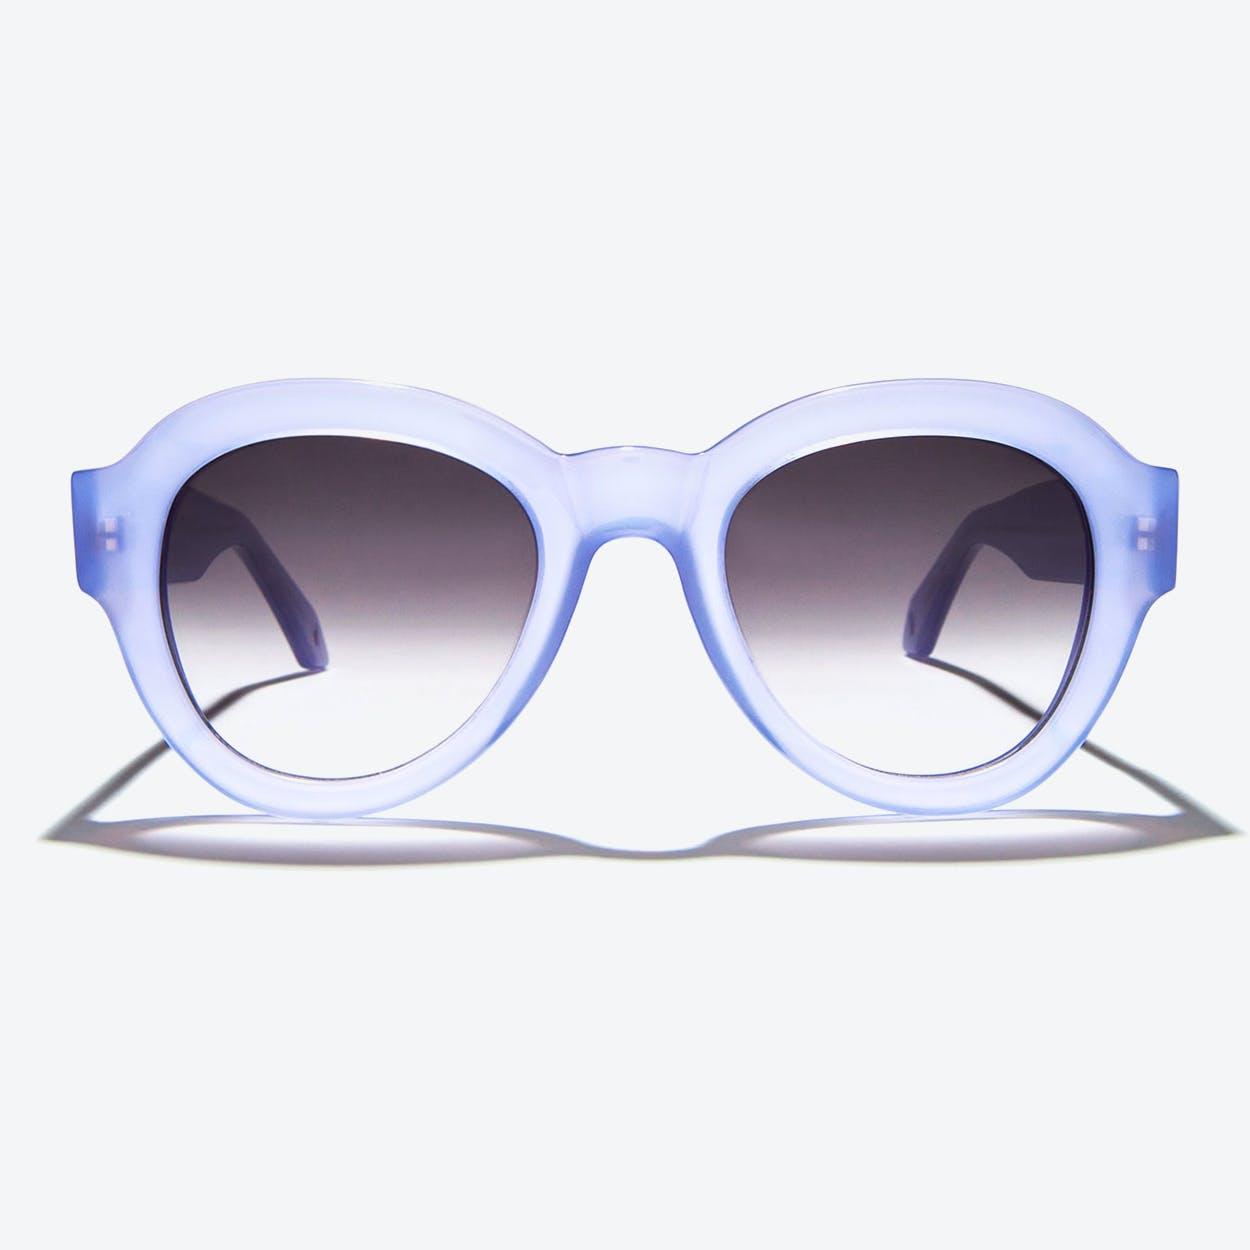 Vega Sunglasses in Lilac